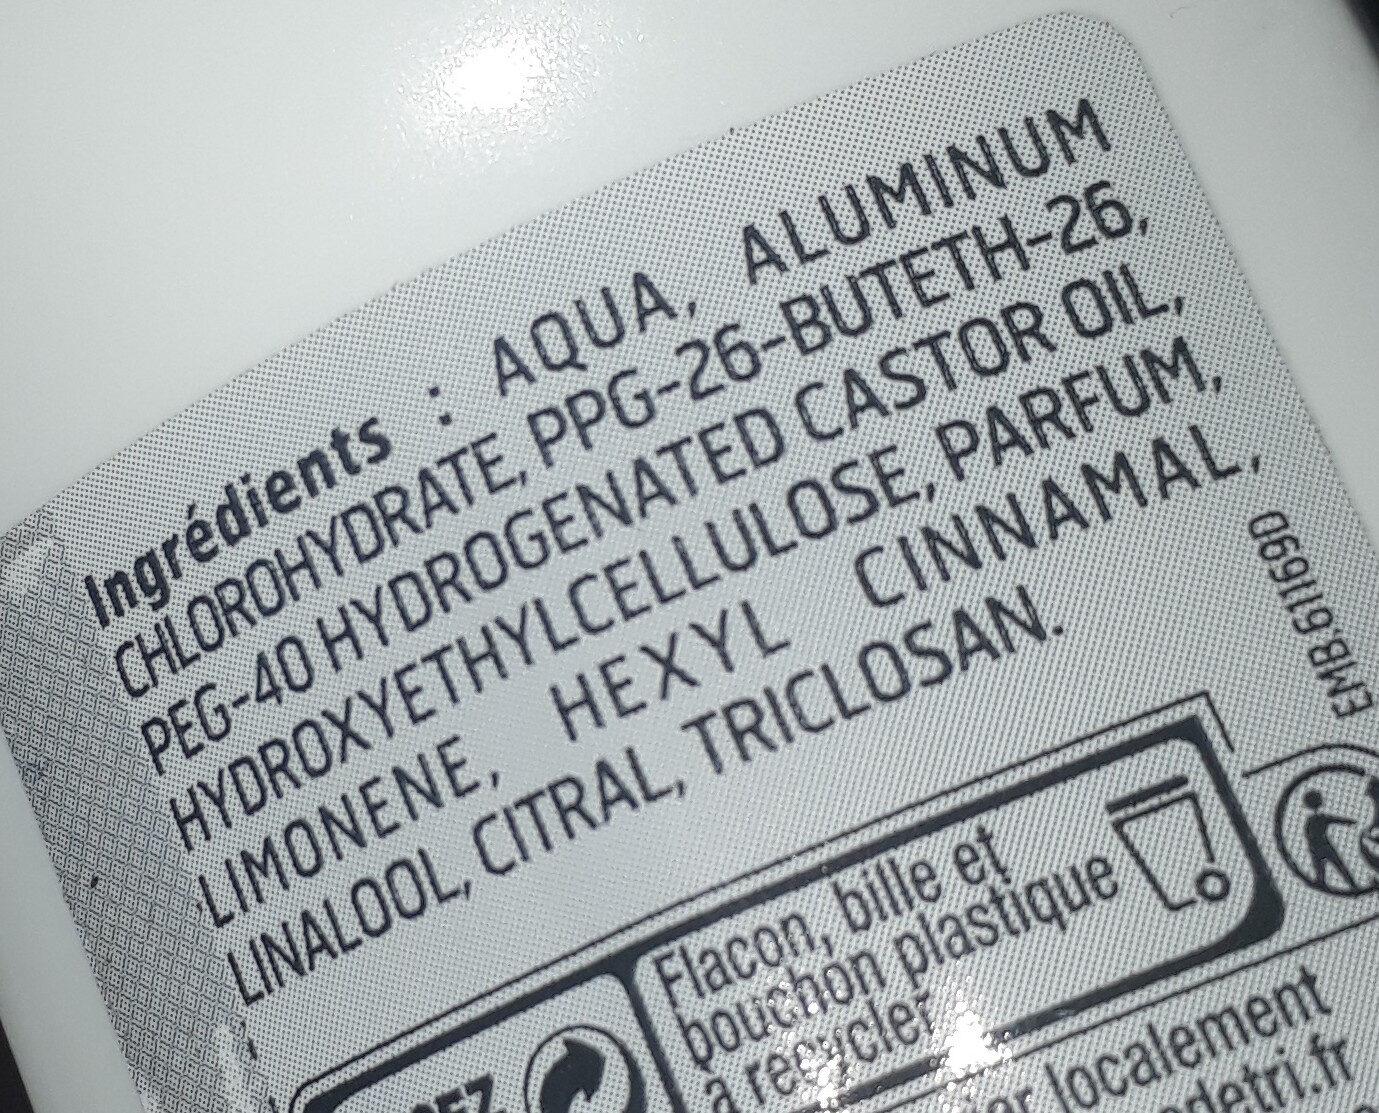 deobille - Ingredients - fr